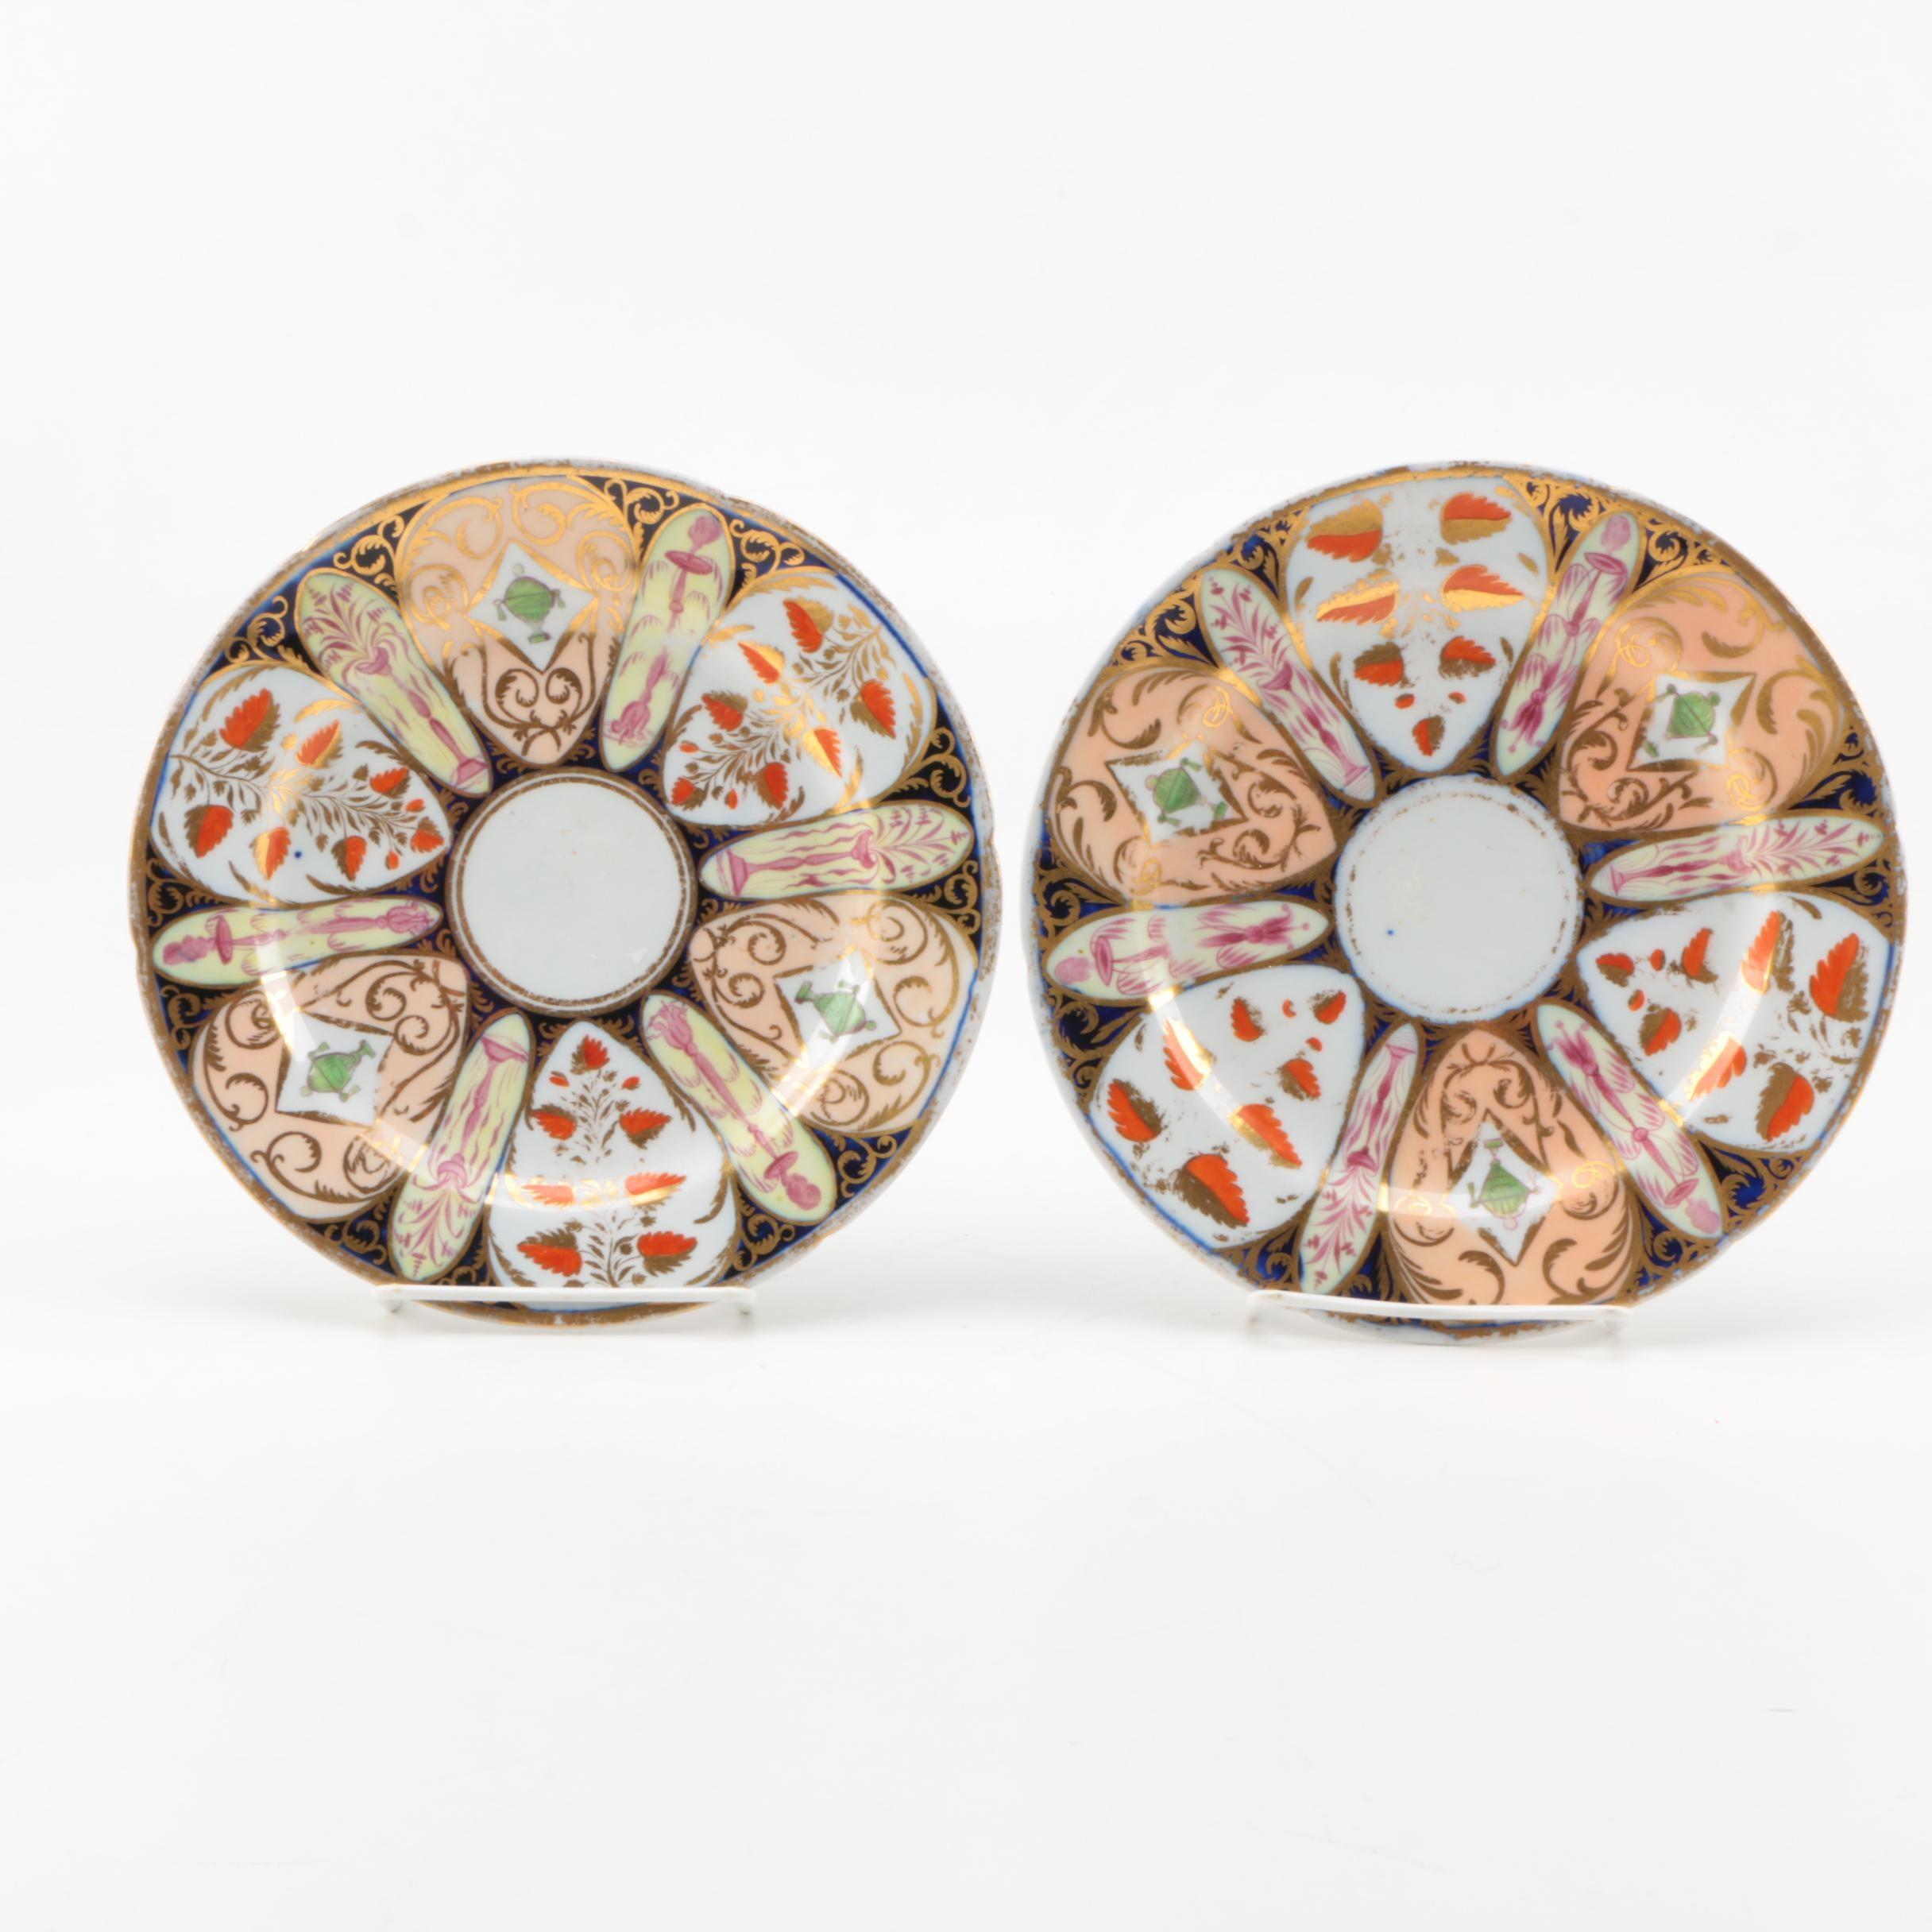 Mid-19th Century English Imari Porcelain Plates